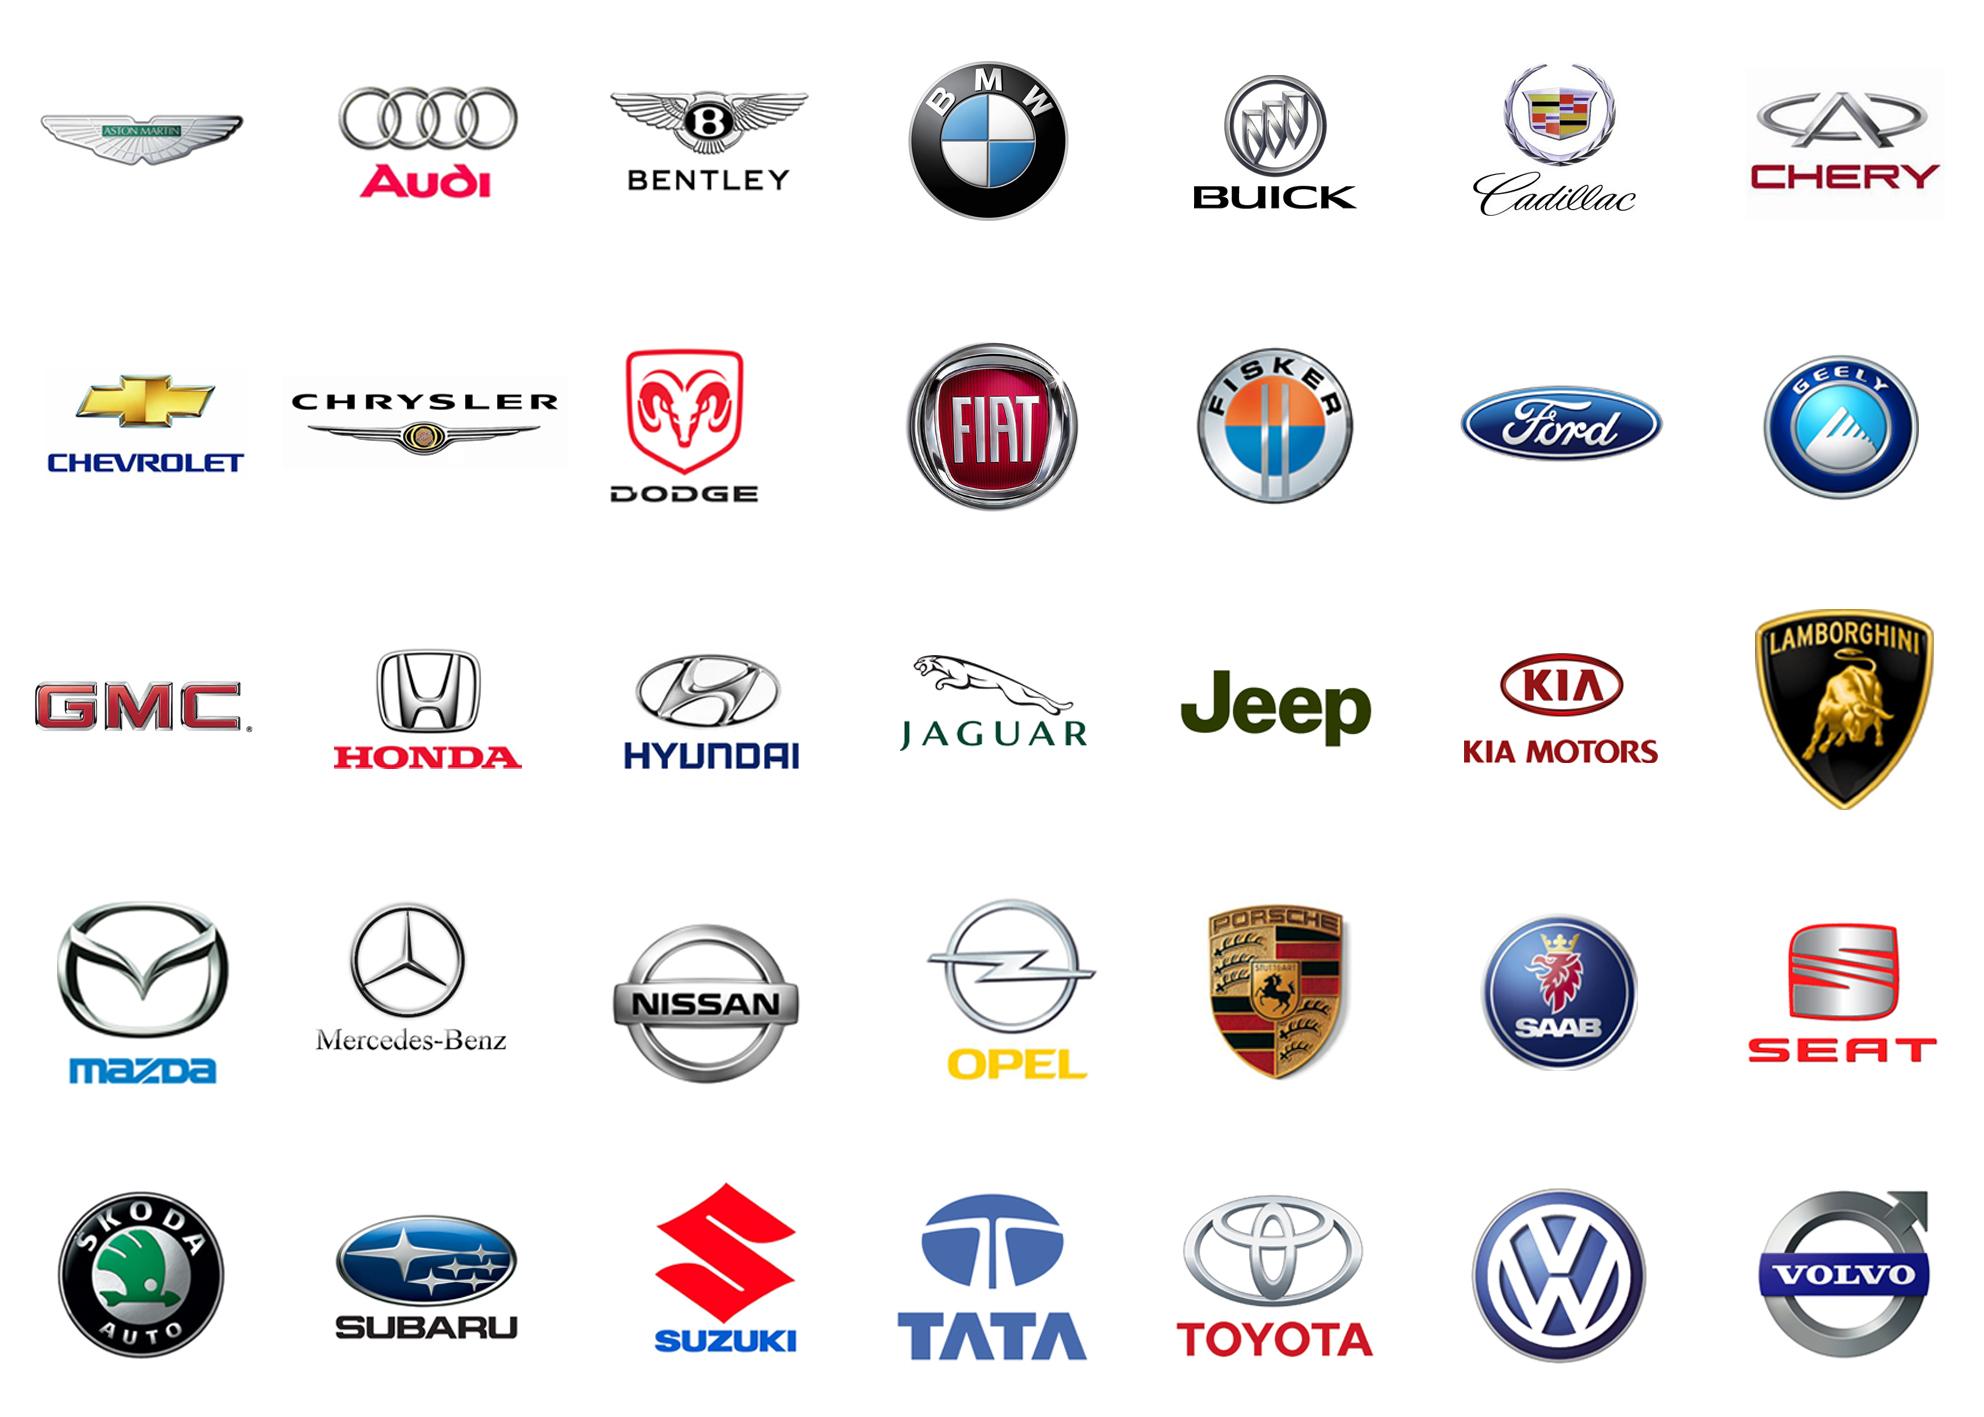 Картинки значков всех марок машин